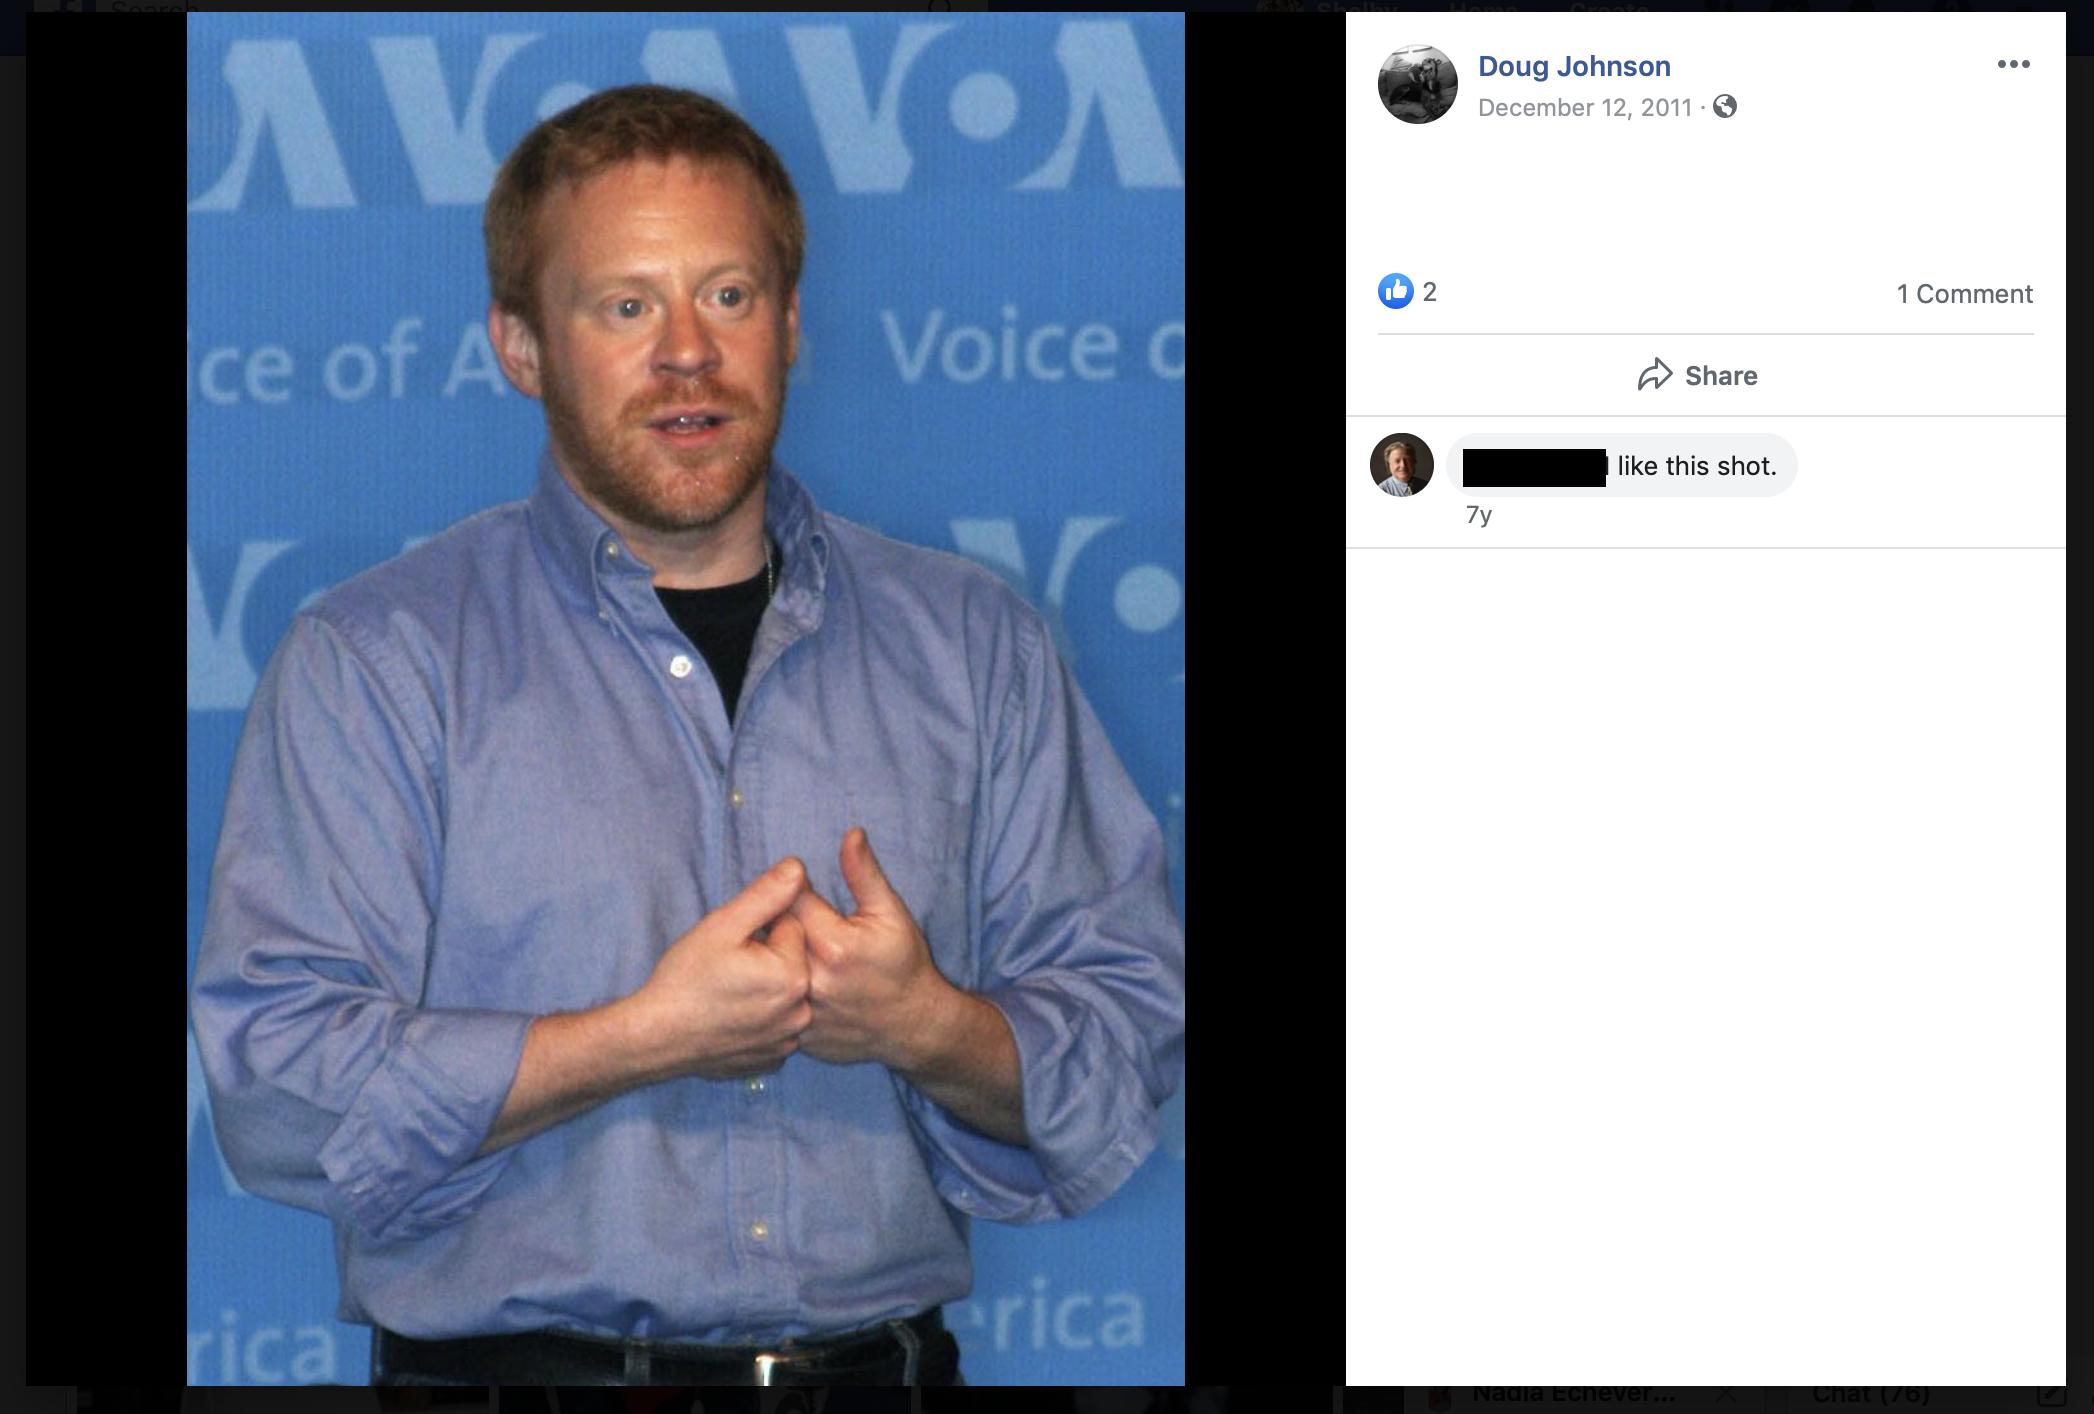 This photo matches the current headshot for Doug Bernard on the VOA website. (Screenshot Facebook/Doug Johnson)